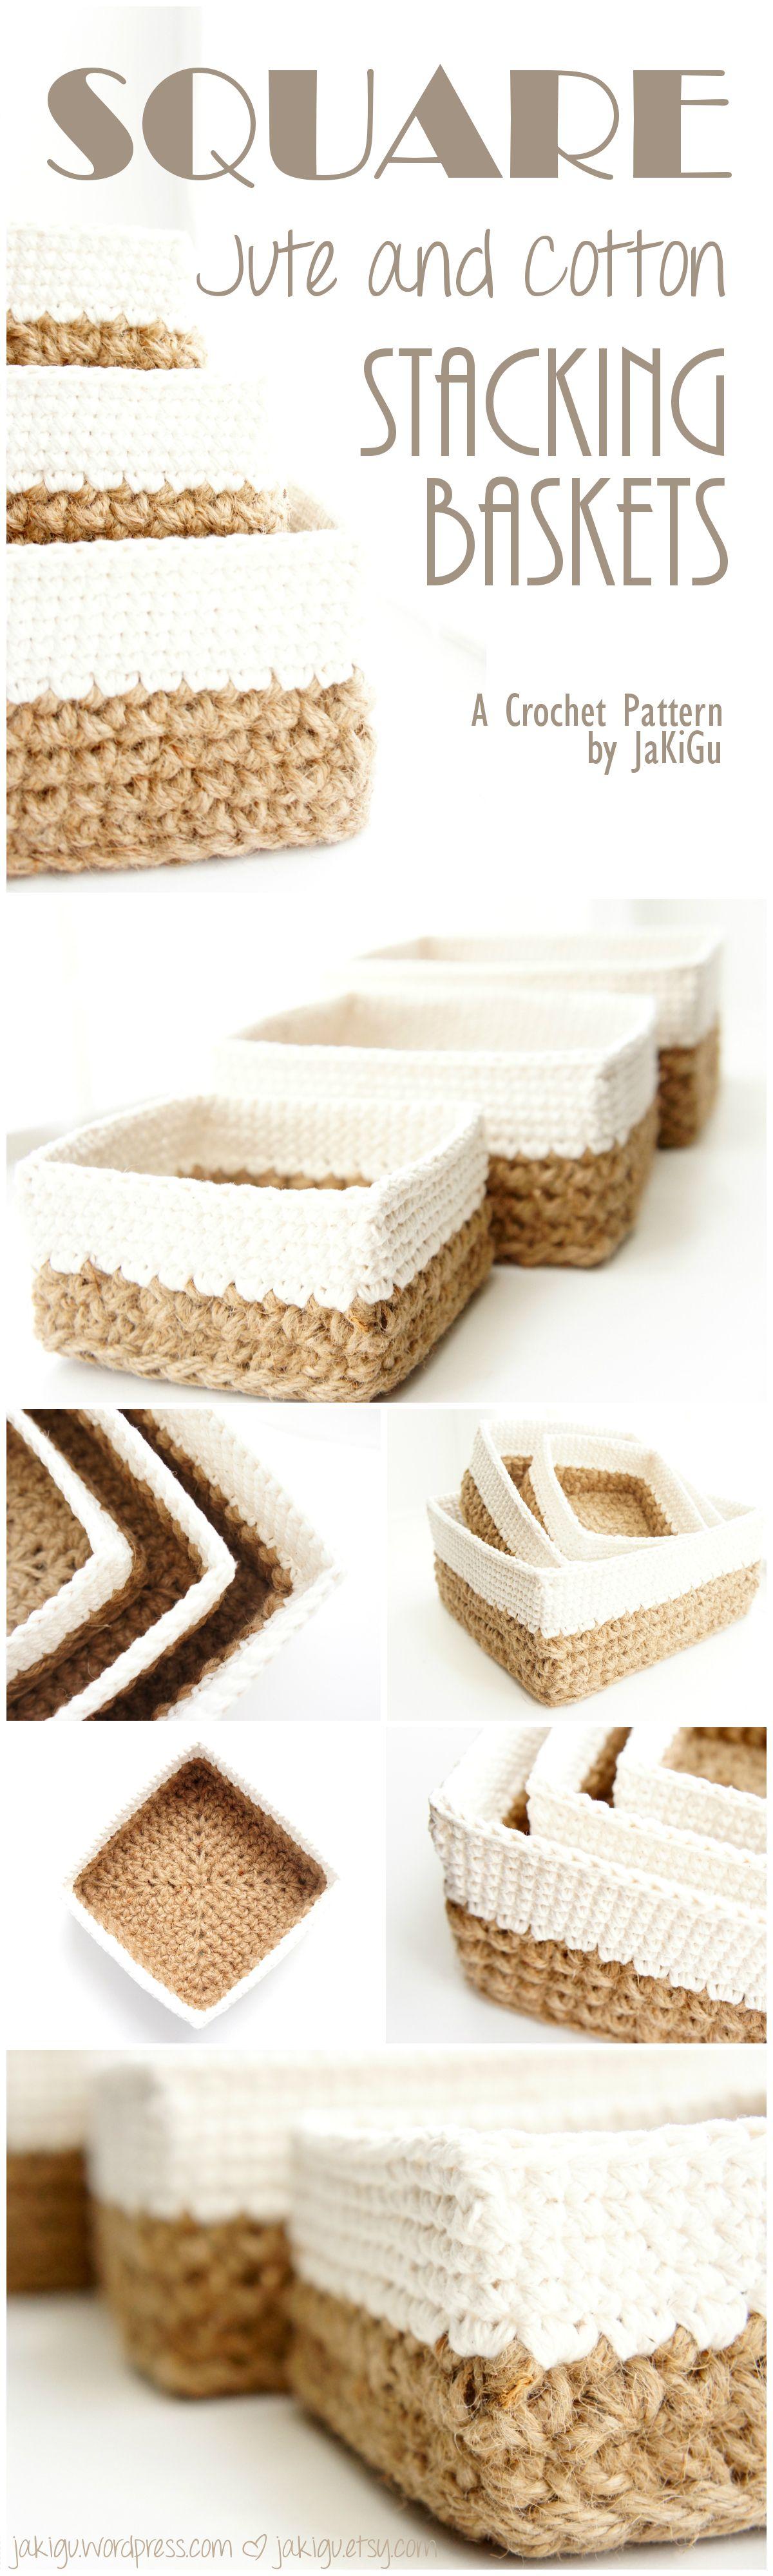 crochet pattern: square jute and cotton stacking baskets | Häkeln